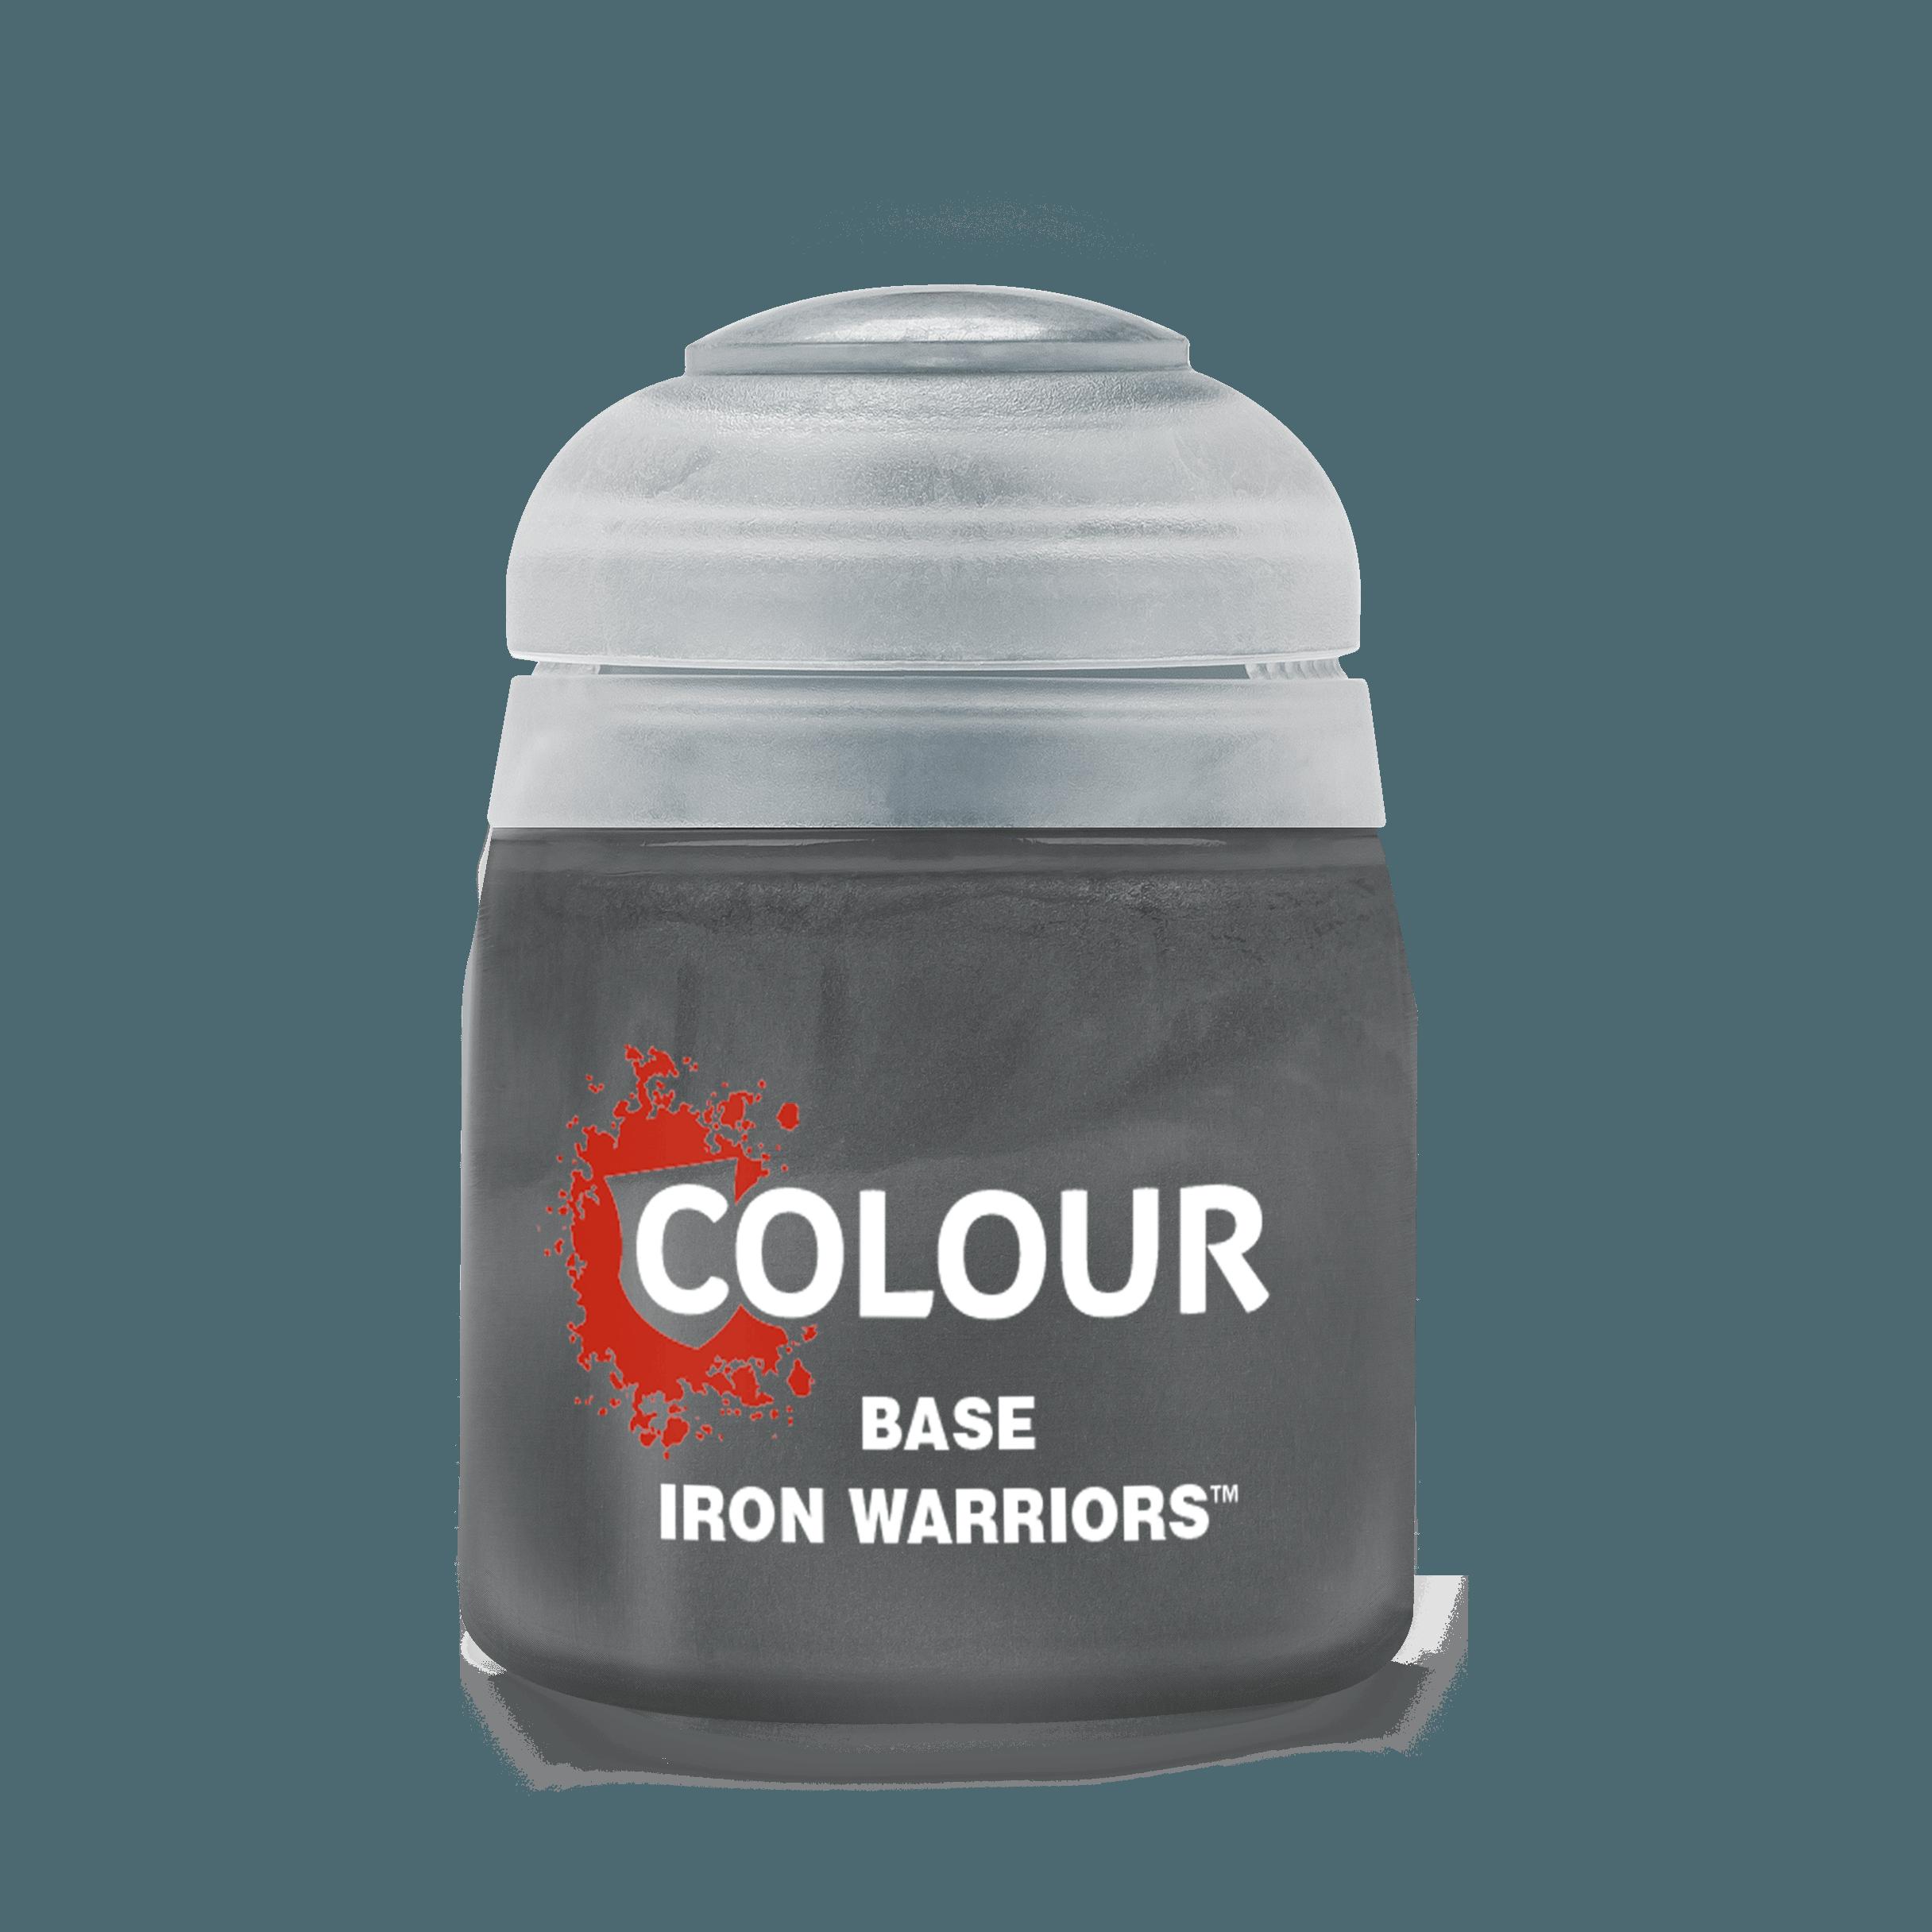 Base Iron Warriors